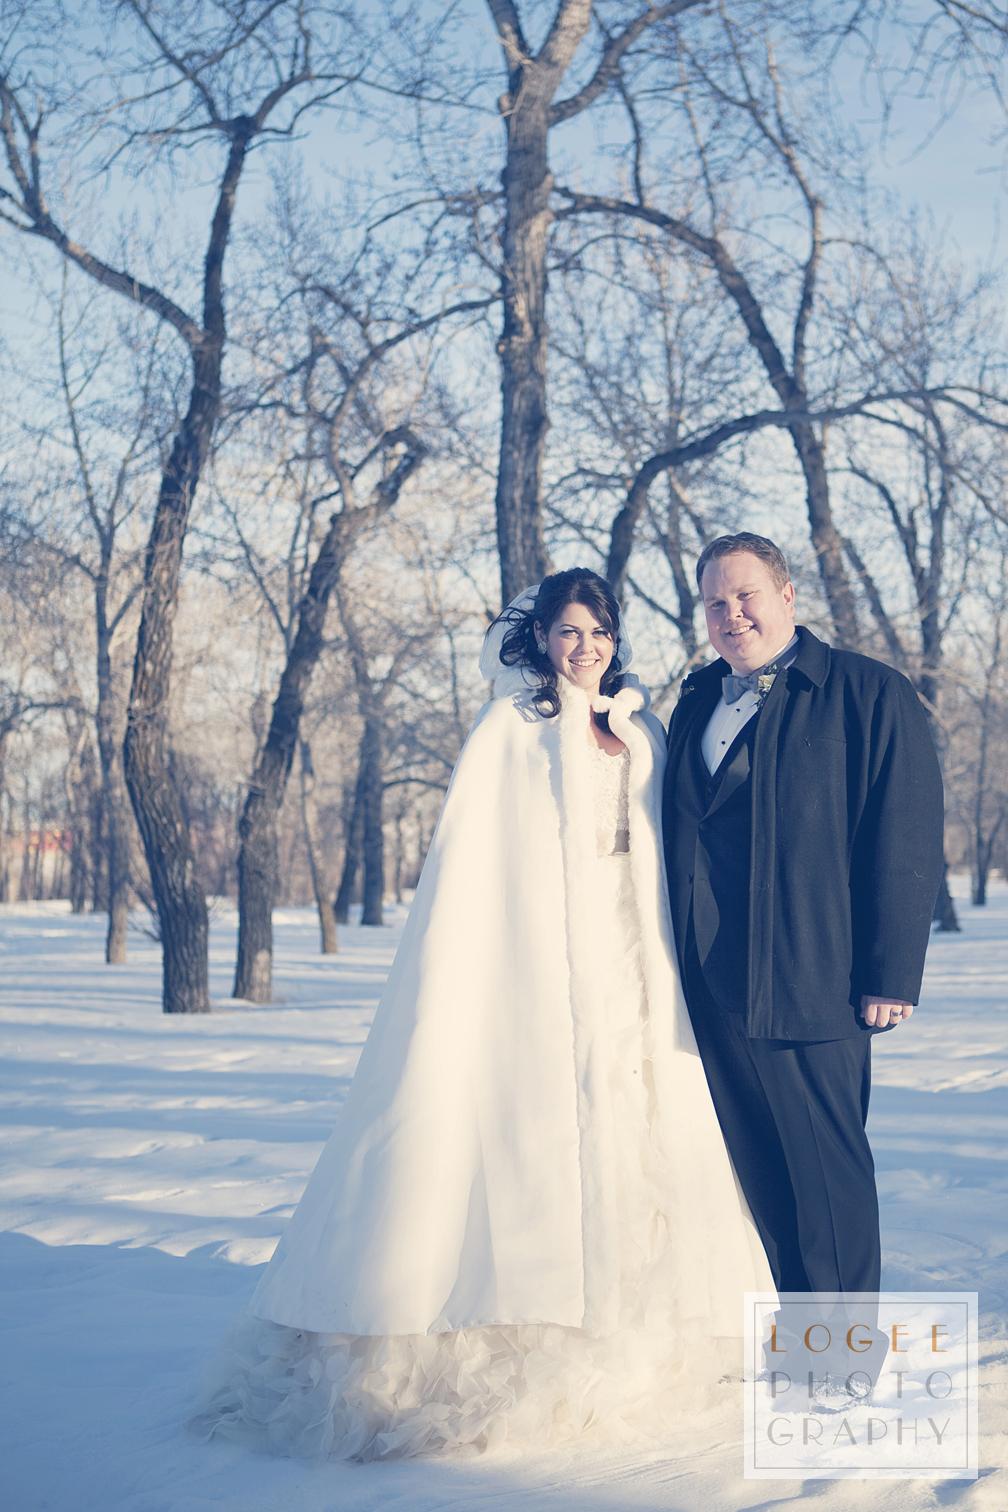 McIntosh-Burns Wedding - 6844Cw